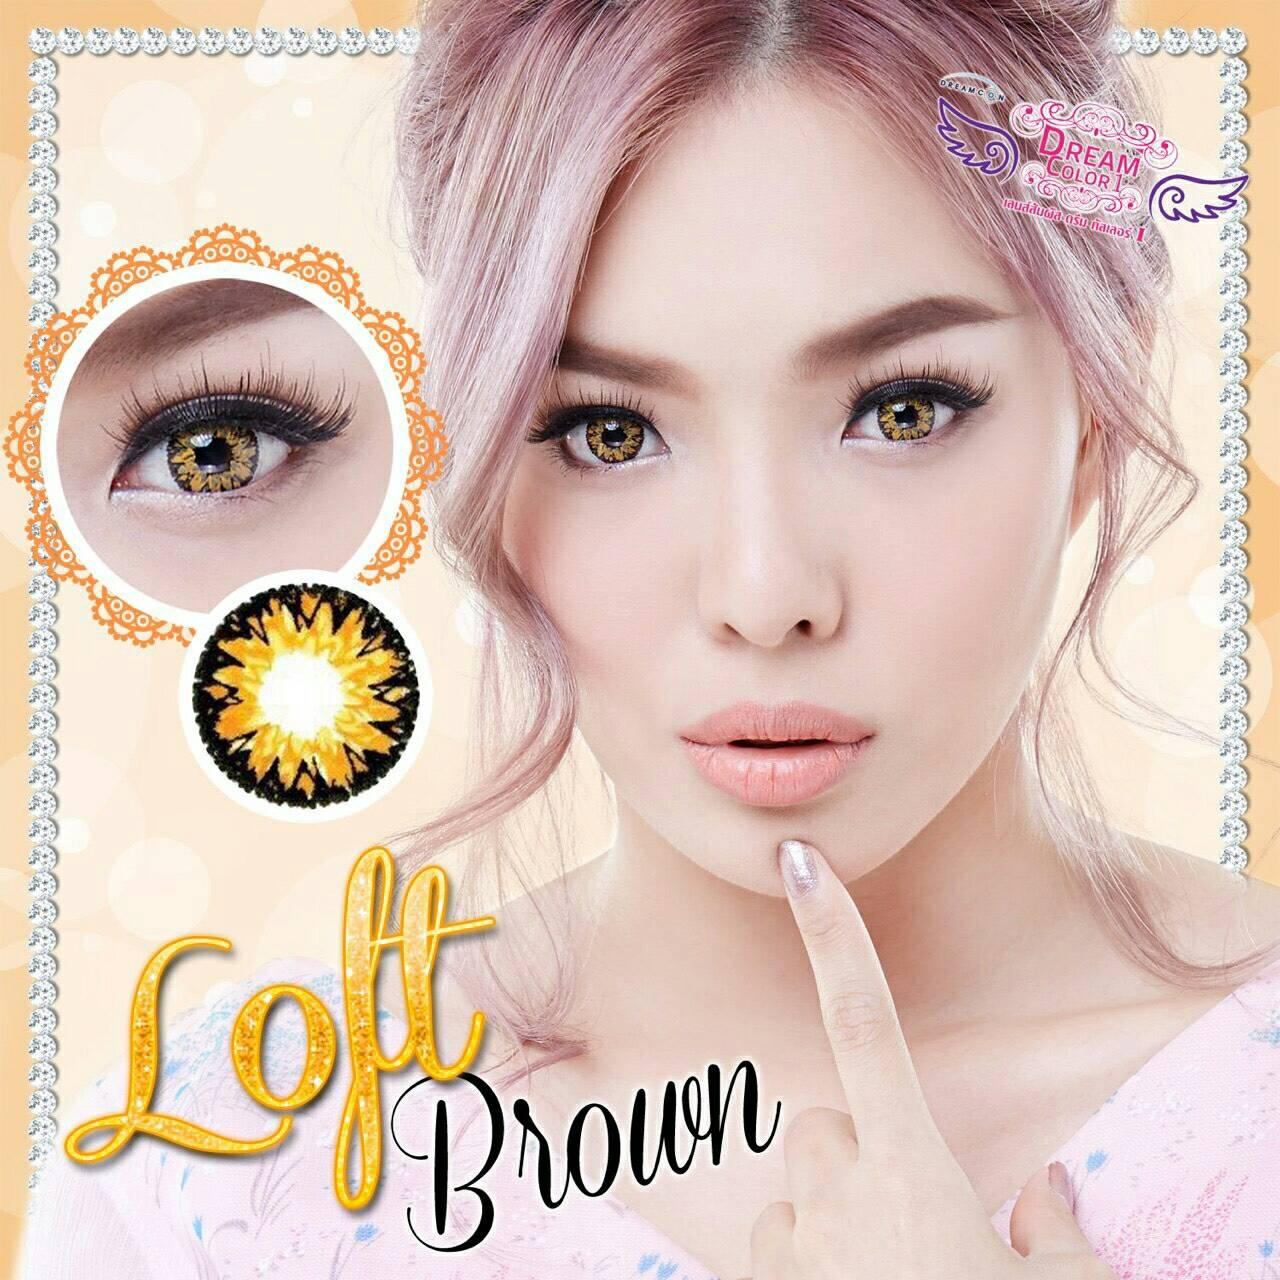 Loft Brown Dreamcolor1เลนส์นิ่มใส่สบาย คอนแทคเลนส์ ขายส่งคอนแทคเลนส์ ขายส่งBigeye Bigeyeเกาหลี